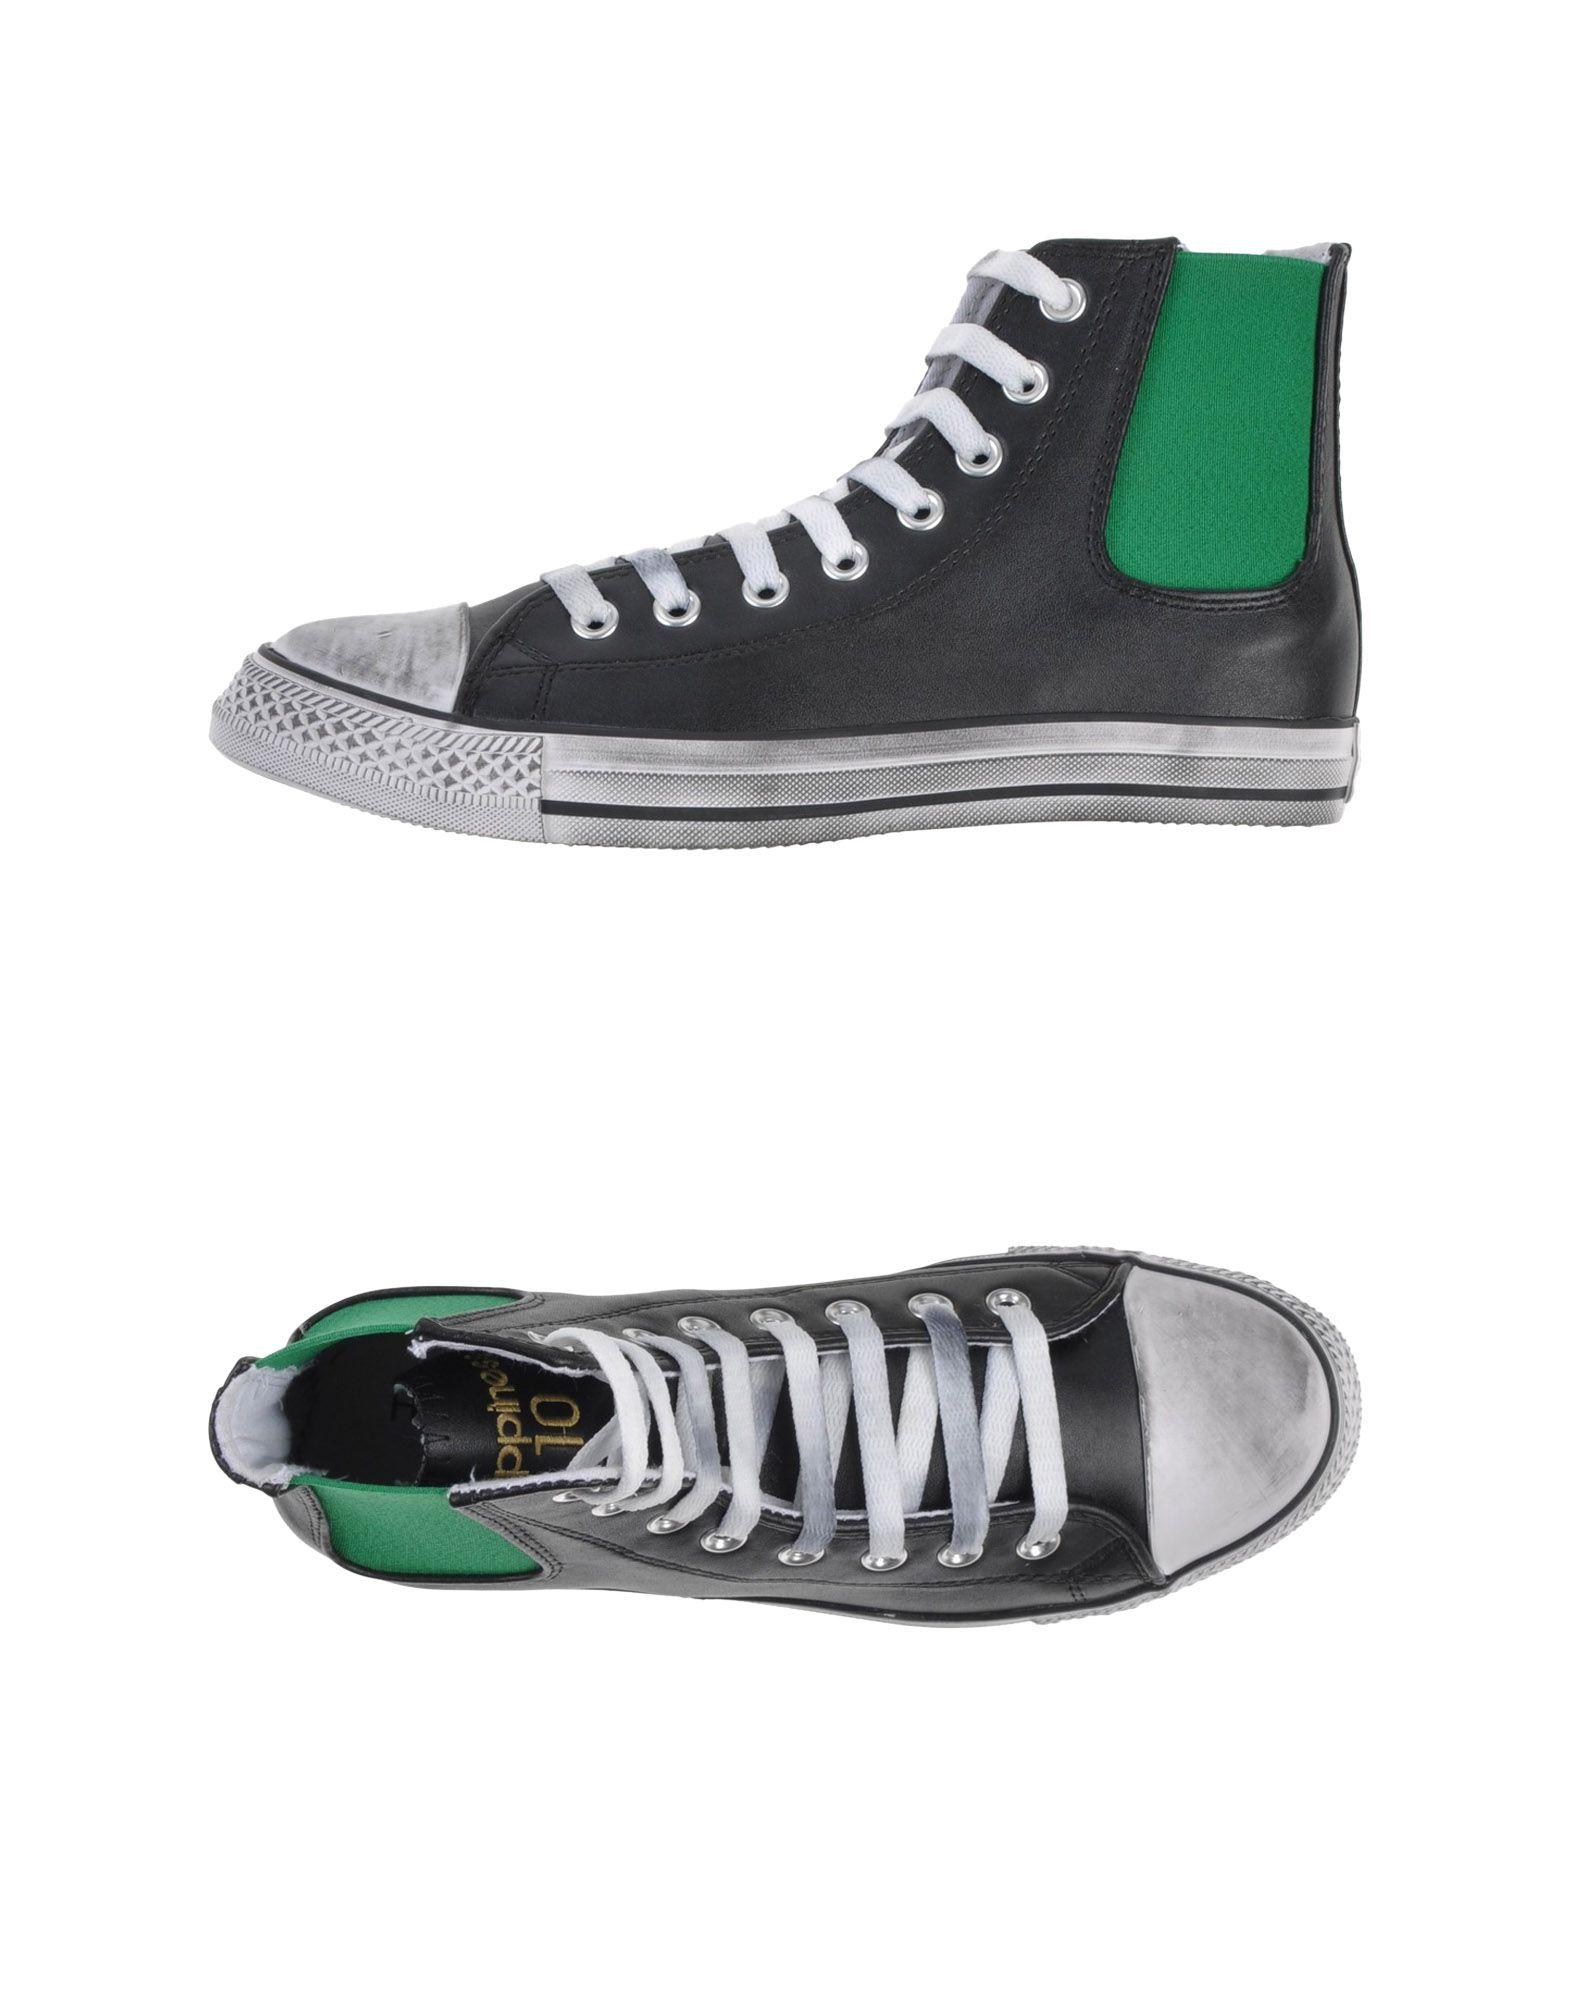 Rabatt echte Schuhe Herren Happiness Sneakers Herren Schuhe  44794480KR e97e28